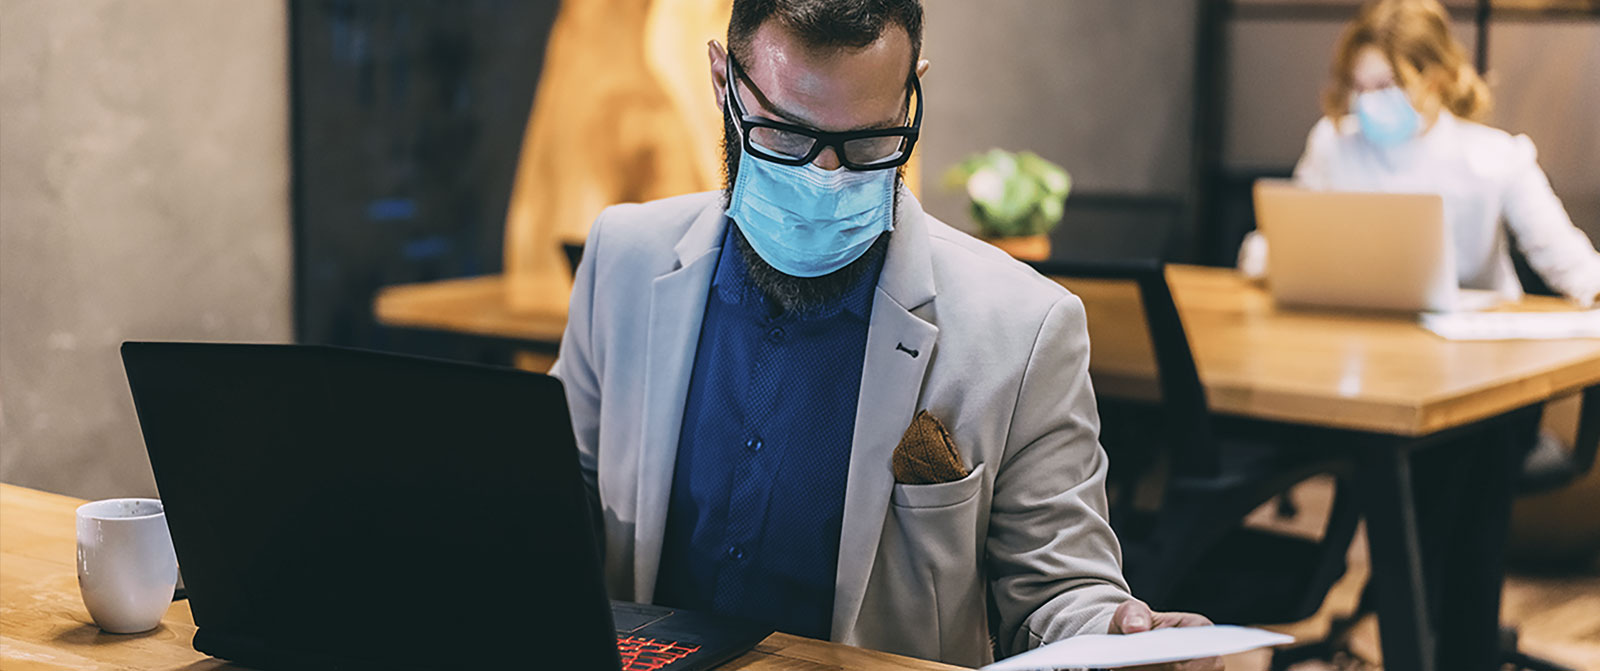 reincorporarse-al-trabajo-covid-19-humana-medicina-prepagada-oficina